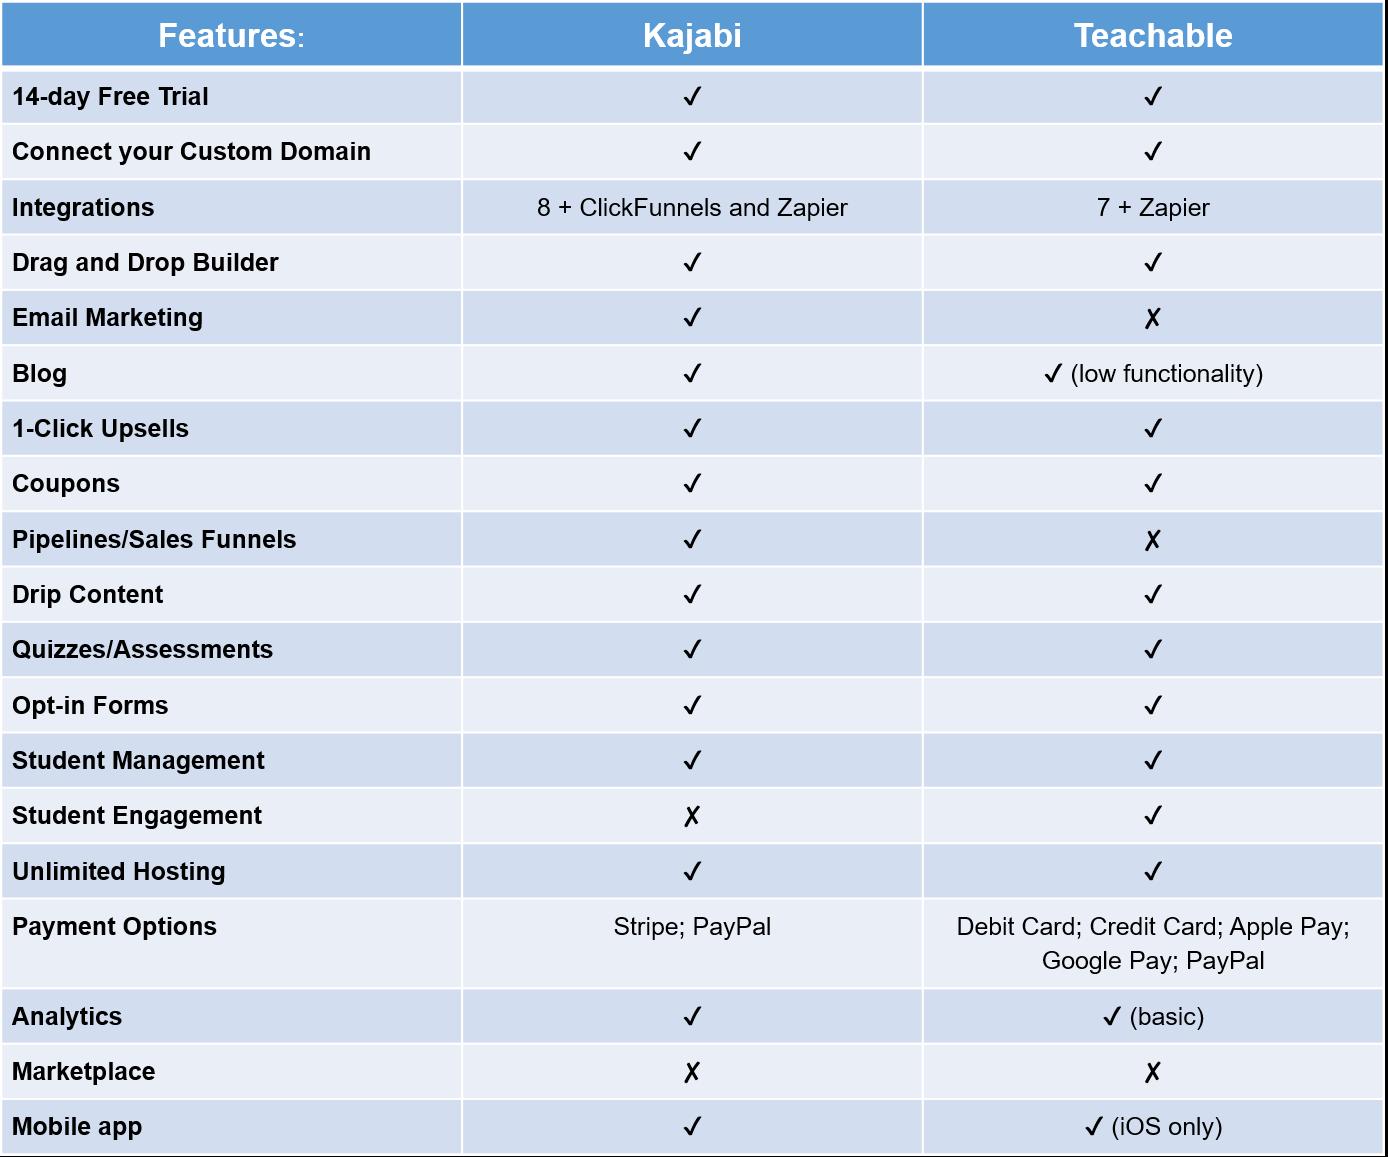 Kajabi vs Teachable: Features